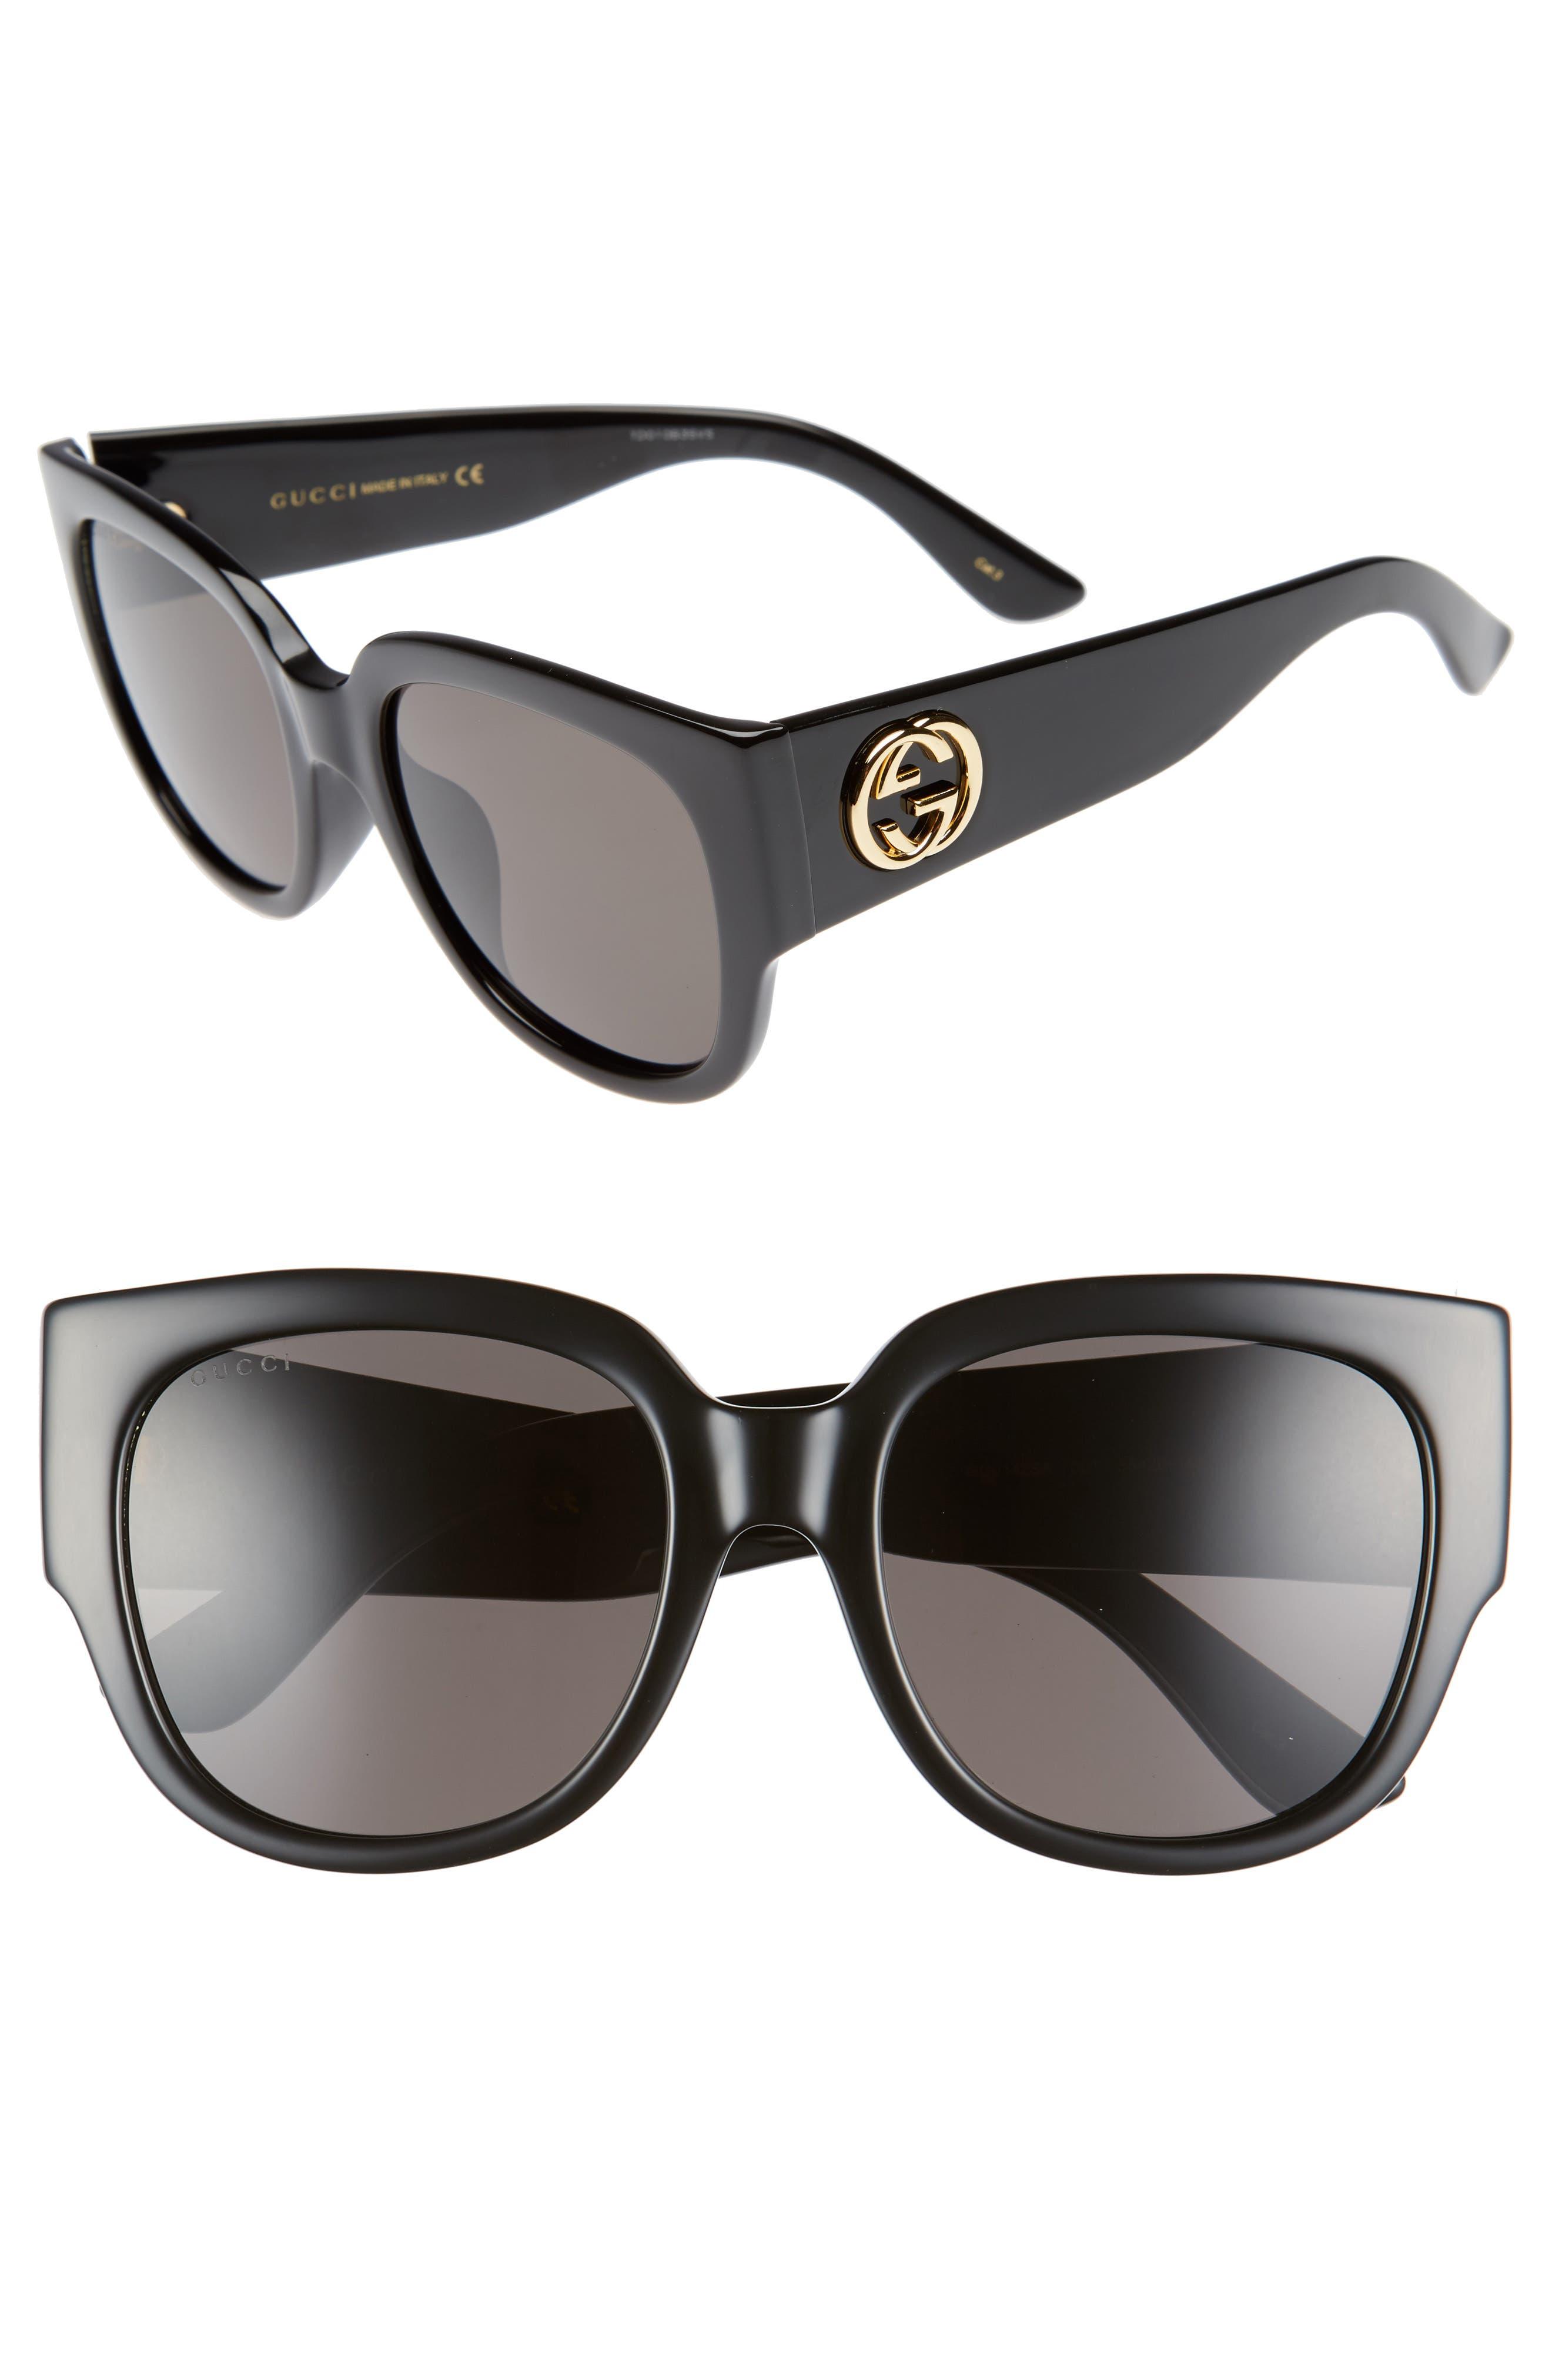 GUCCI 55mm Square Cat Eye Sunglasses